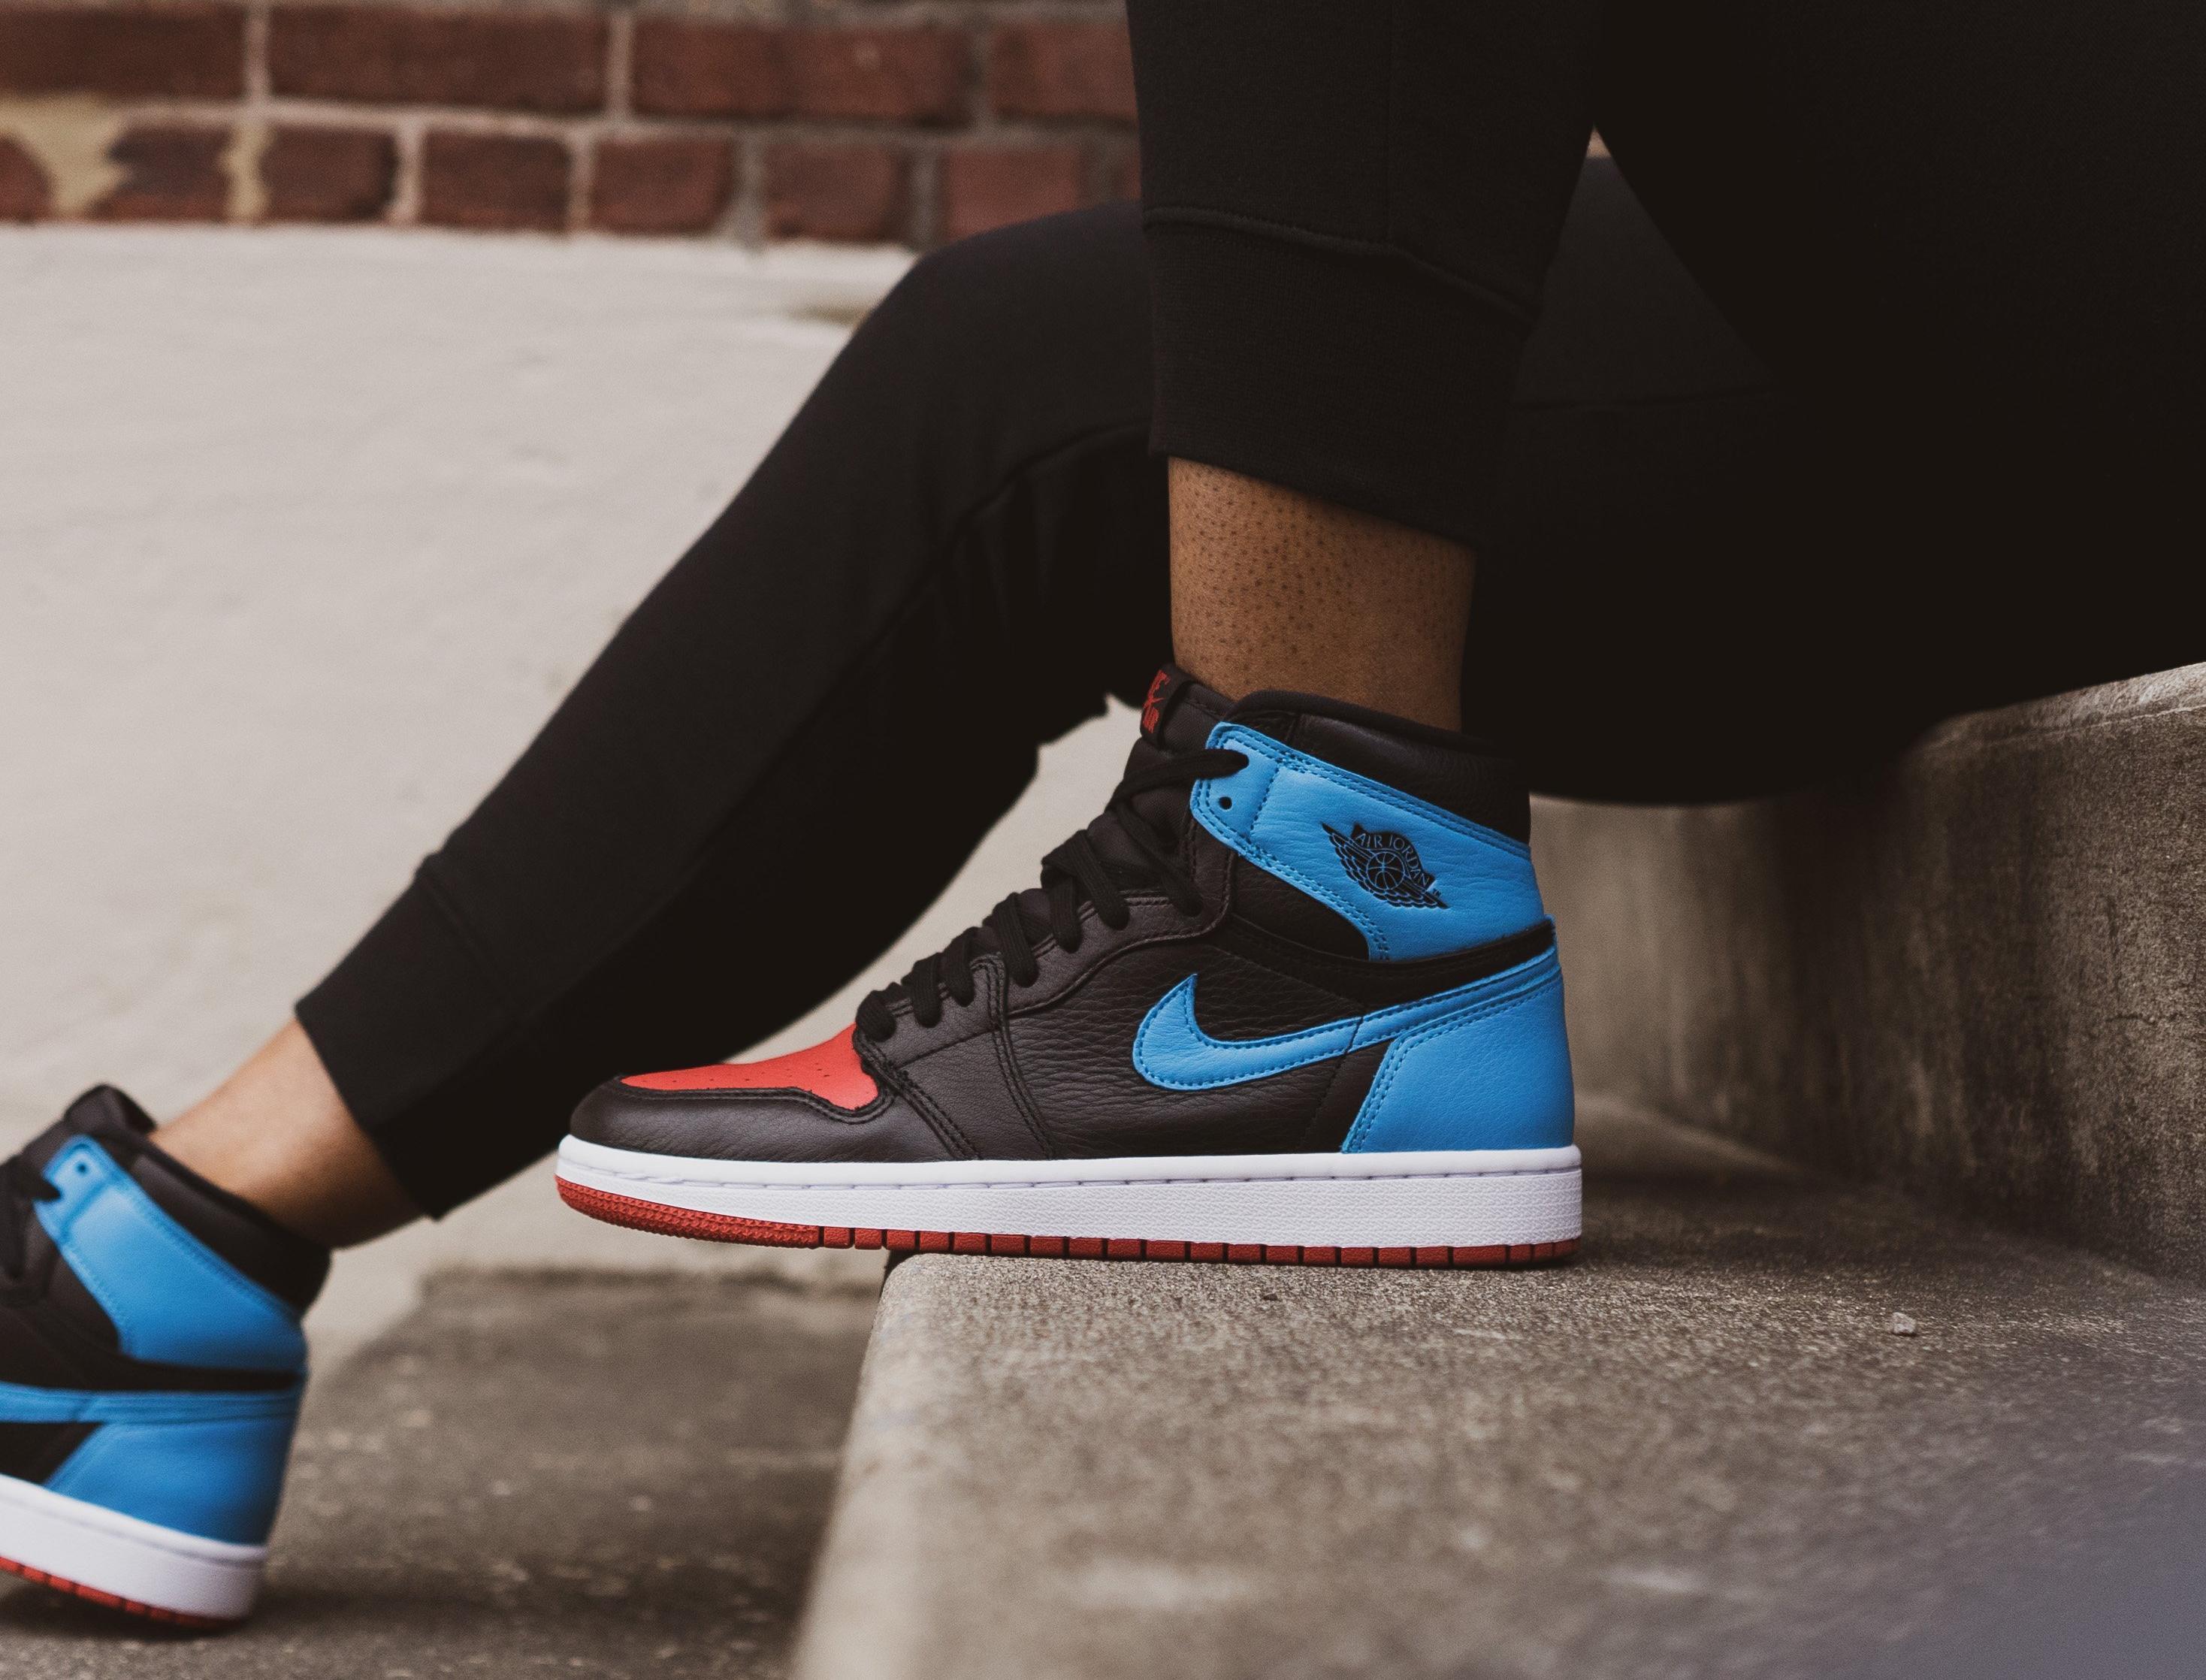 Sneakers Release Air Jordan 1 High Og Unc To Chicago Black